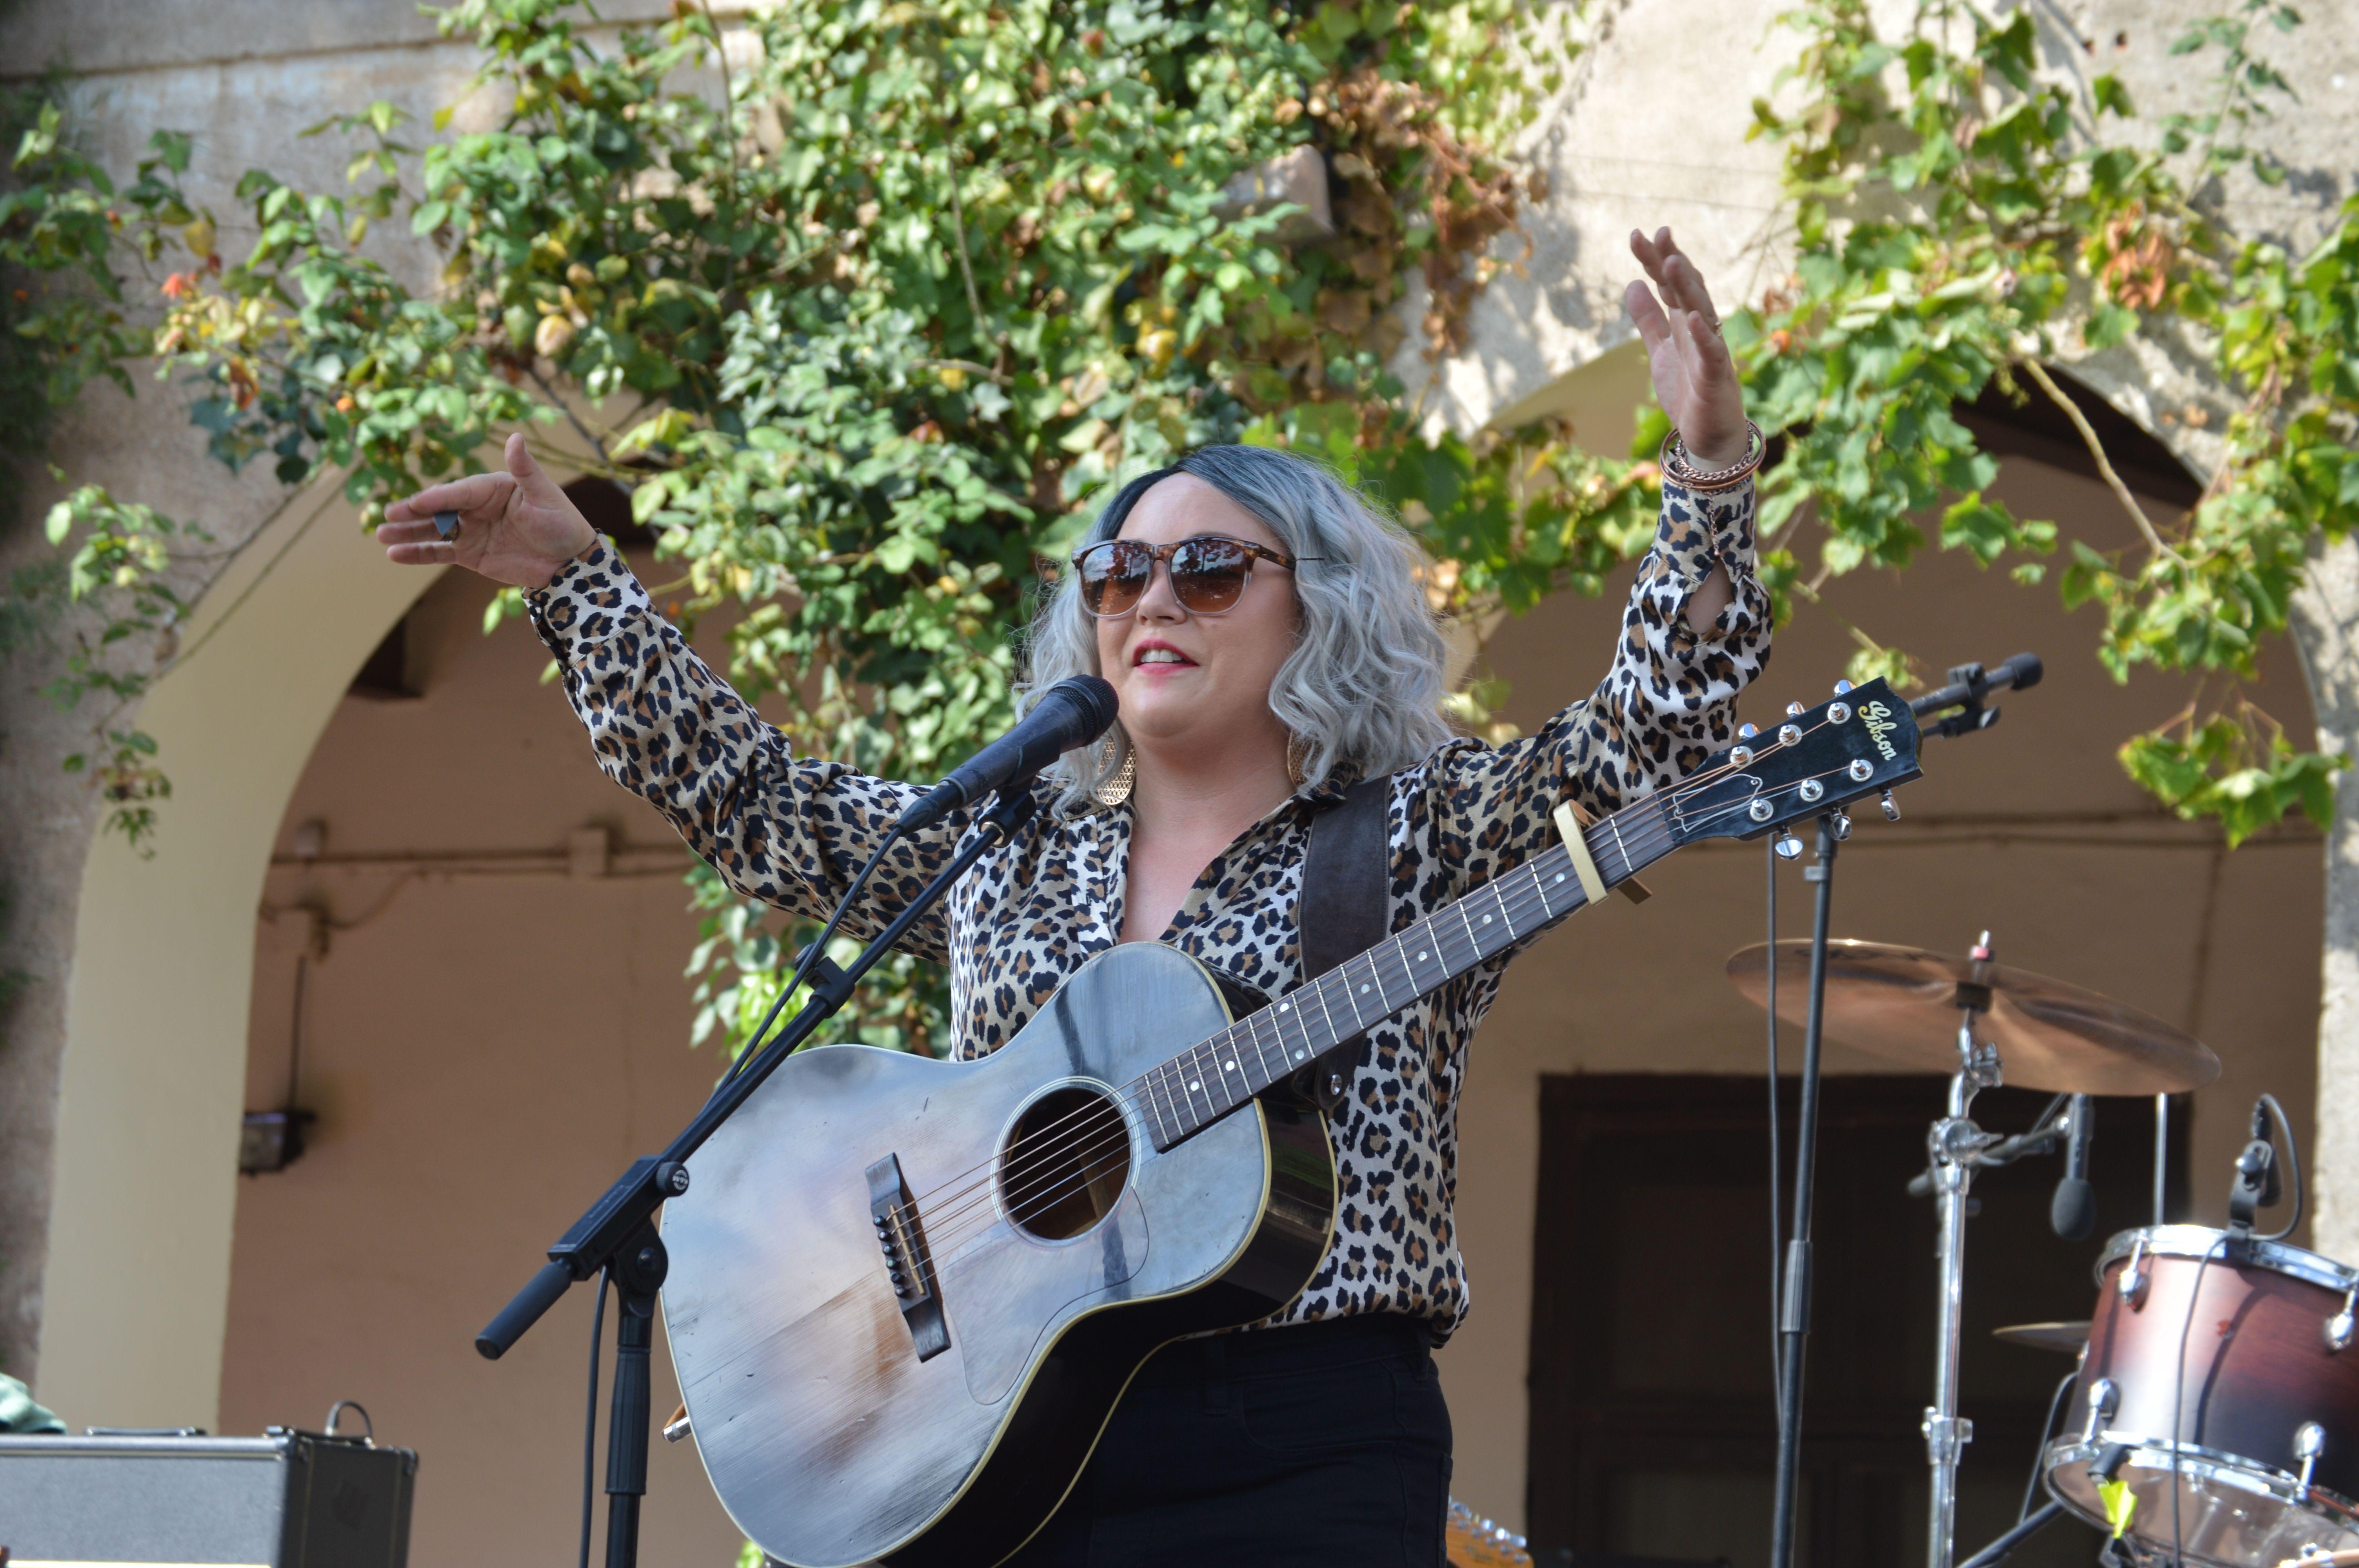 Vocal del concert de Samantha Martin & Delta Sugar dissabte a Can Cordelles. FOTO, Nora Muñoz